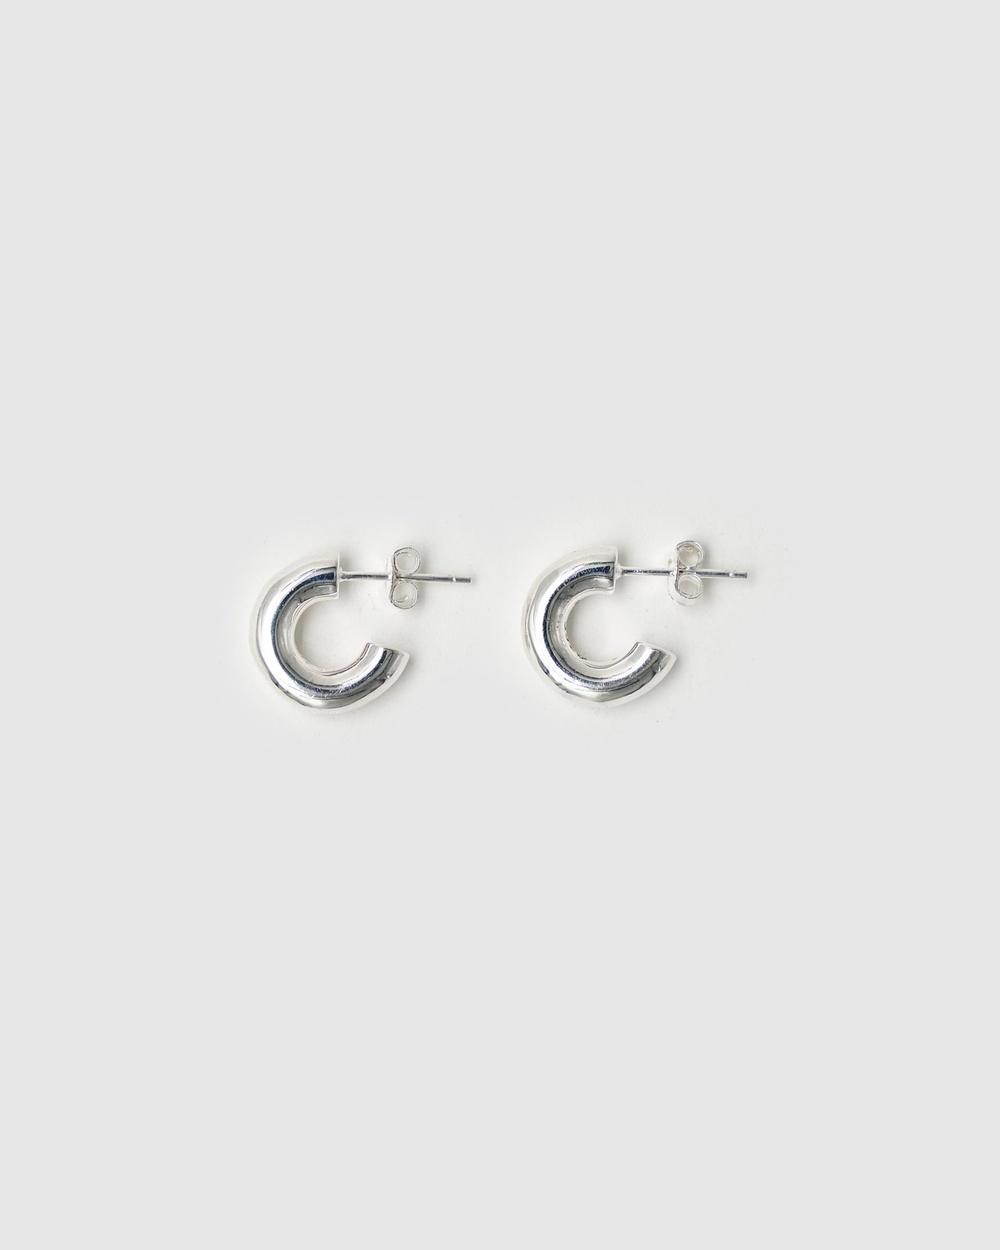 Brie Leon 925 Solid Everyday Mini Stud Earrings Jewellery Silver